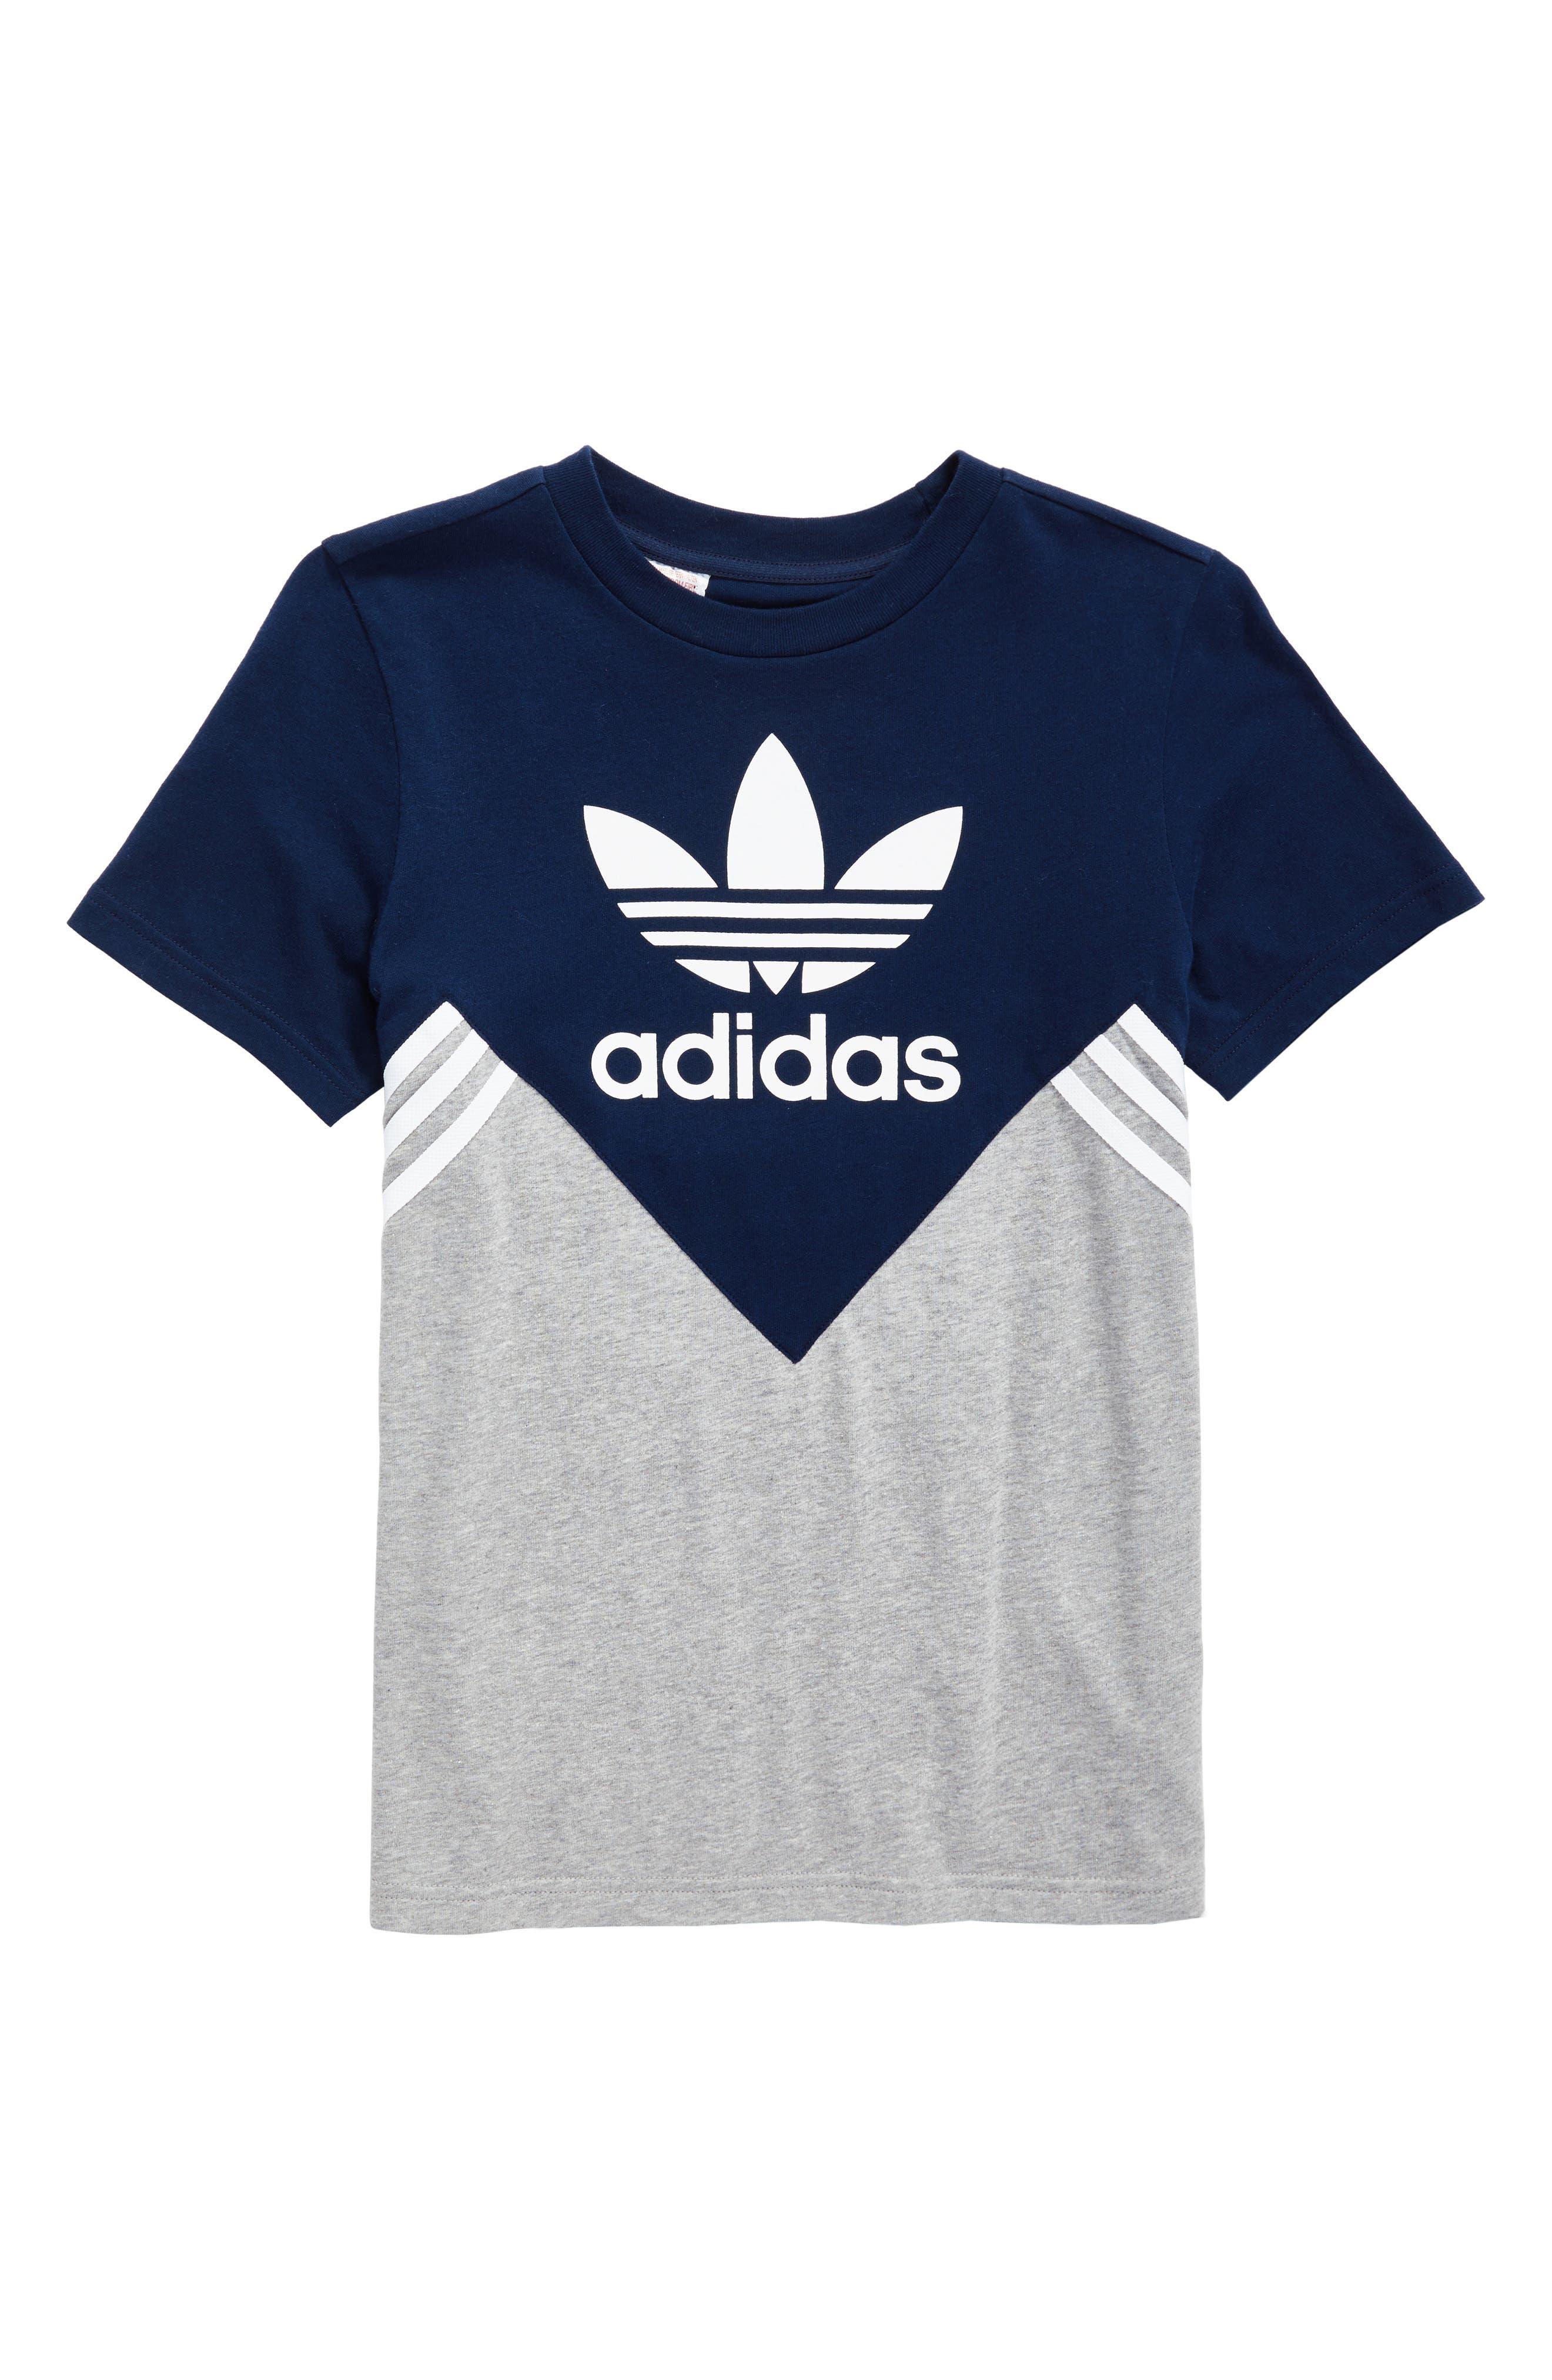 adidas FL Logo Graphic T-Shirt (Little Boys)